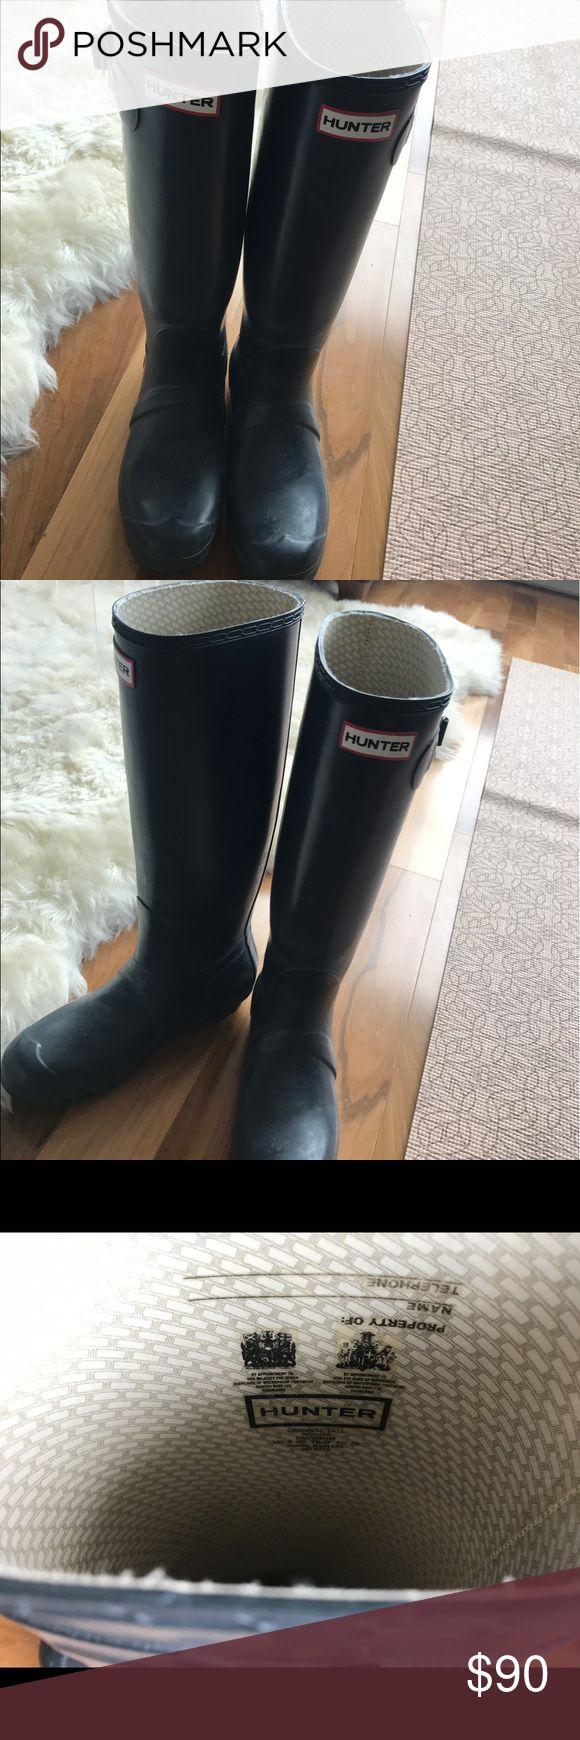 Hunter Rain Boots Smoke blue Hunter rain boots to the knee, super comfortable and waterproof Hunter Boots Shoes Winter & Rain Boots